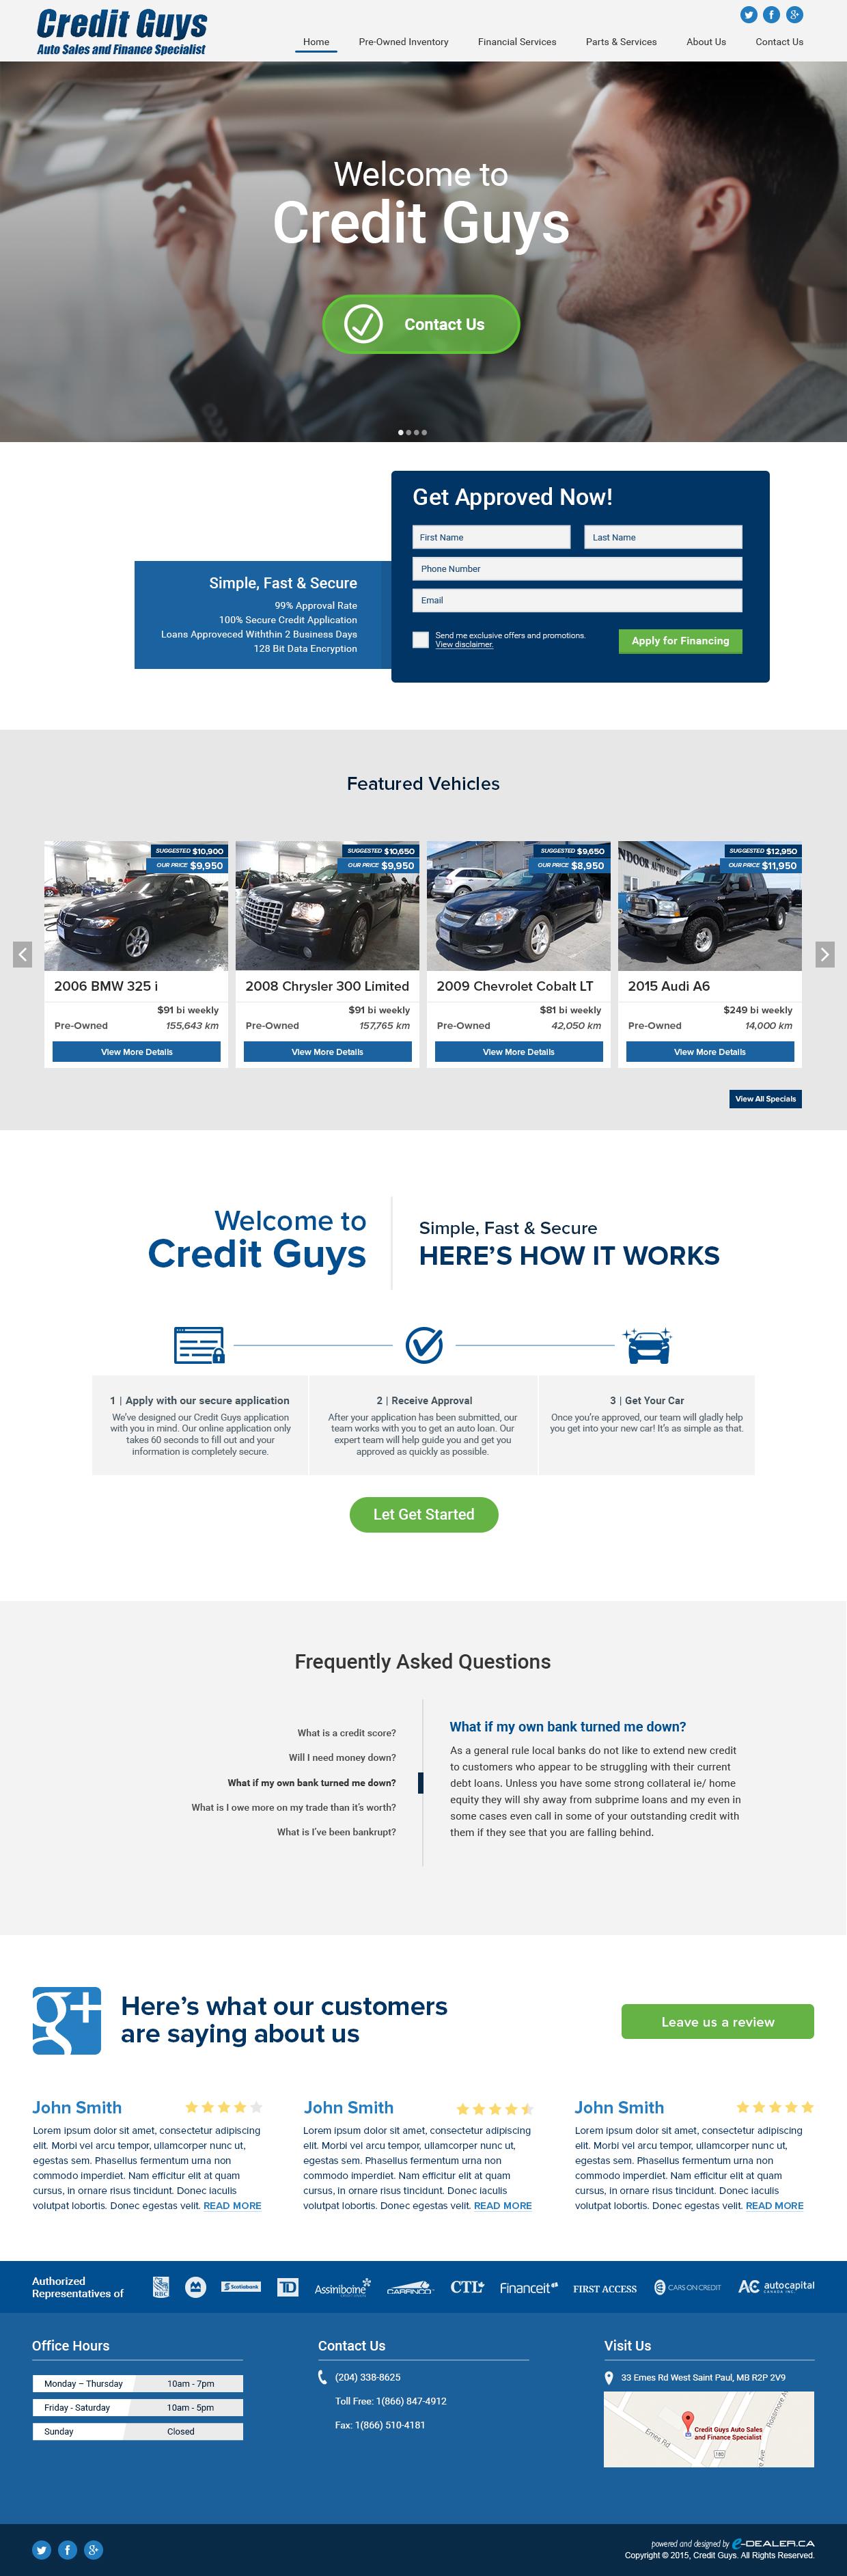 CreditGuys-2